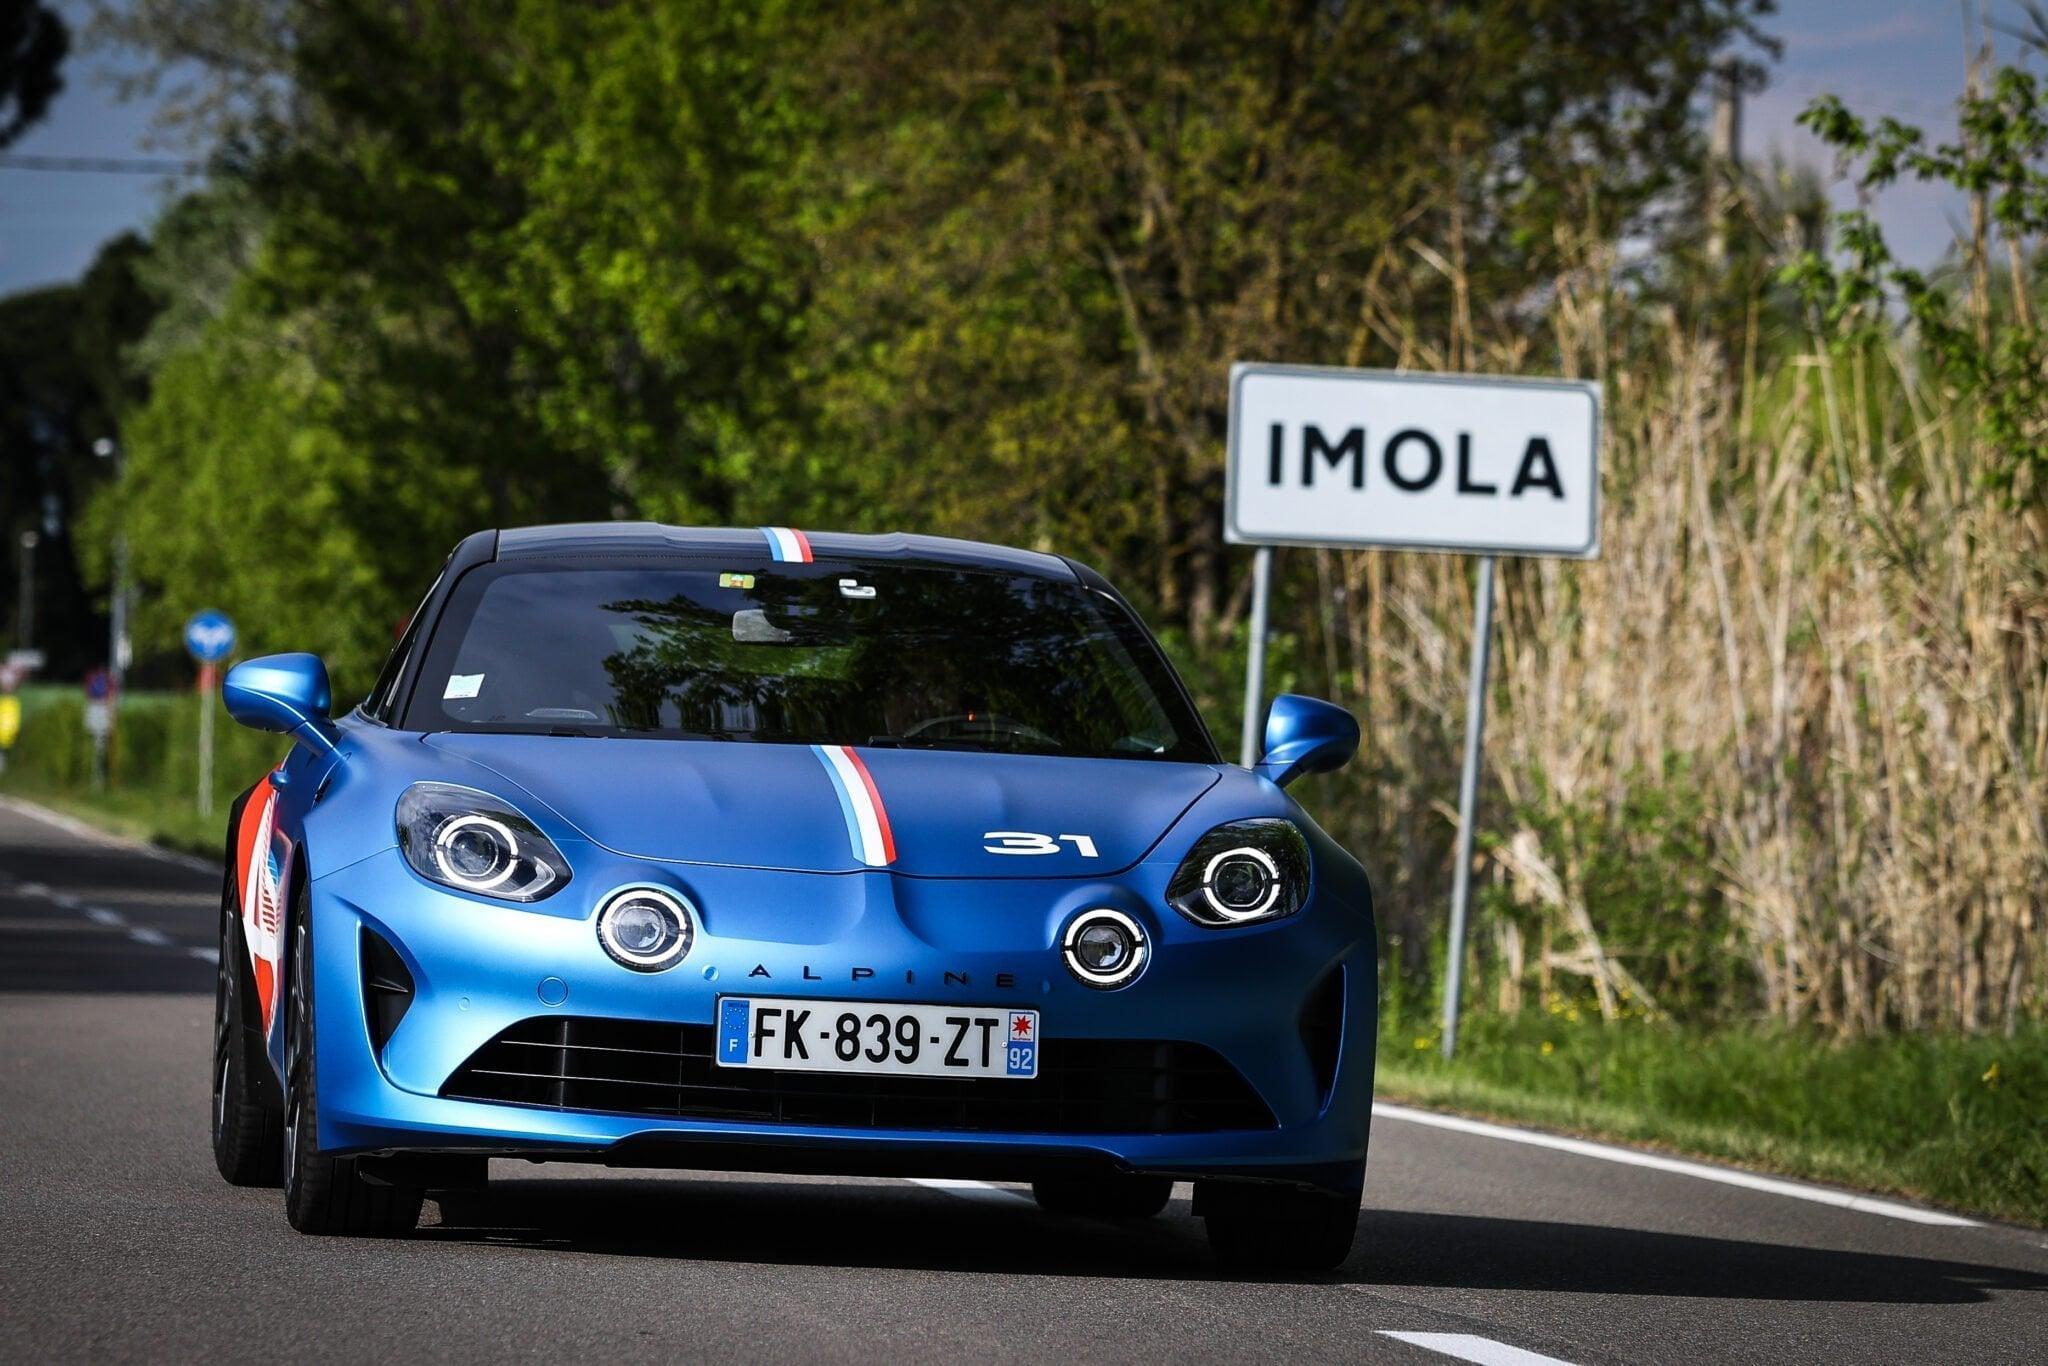 Alpine A110 Trackside Alonso Ocon 2021 14 | Alpine A110 Trackside : la berlinette aux couleurs de la F1